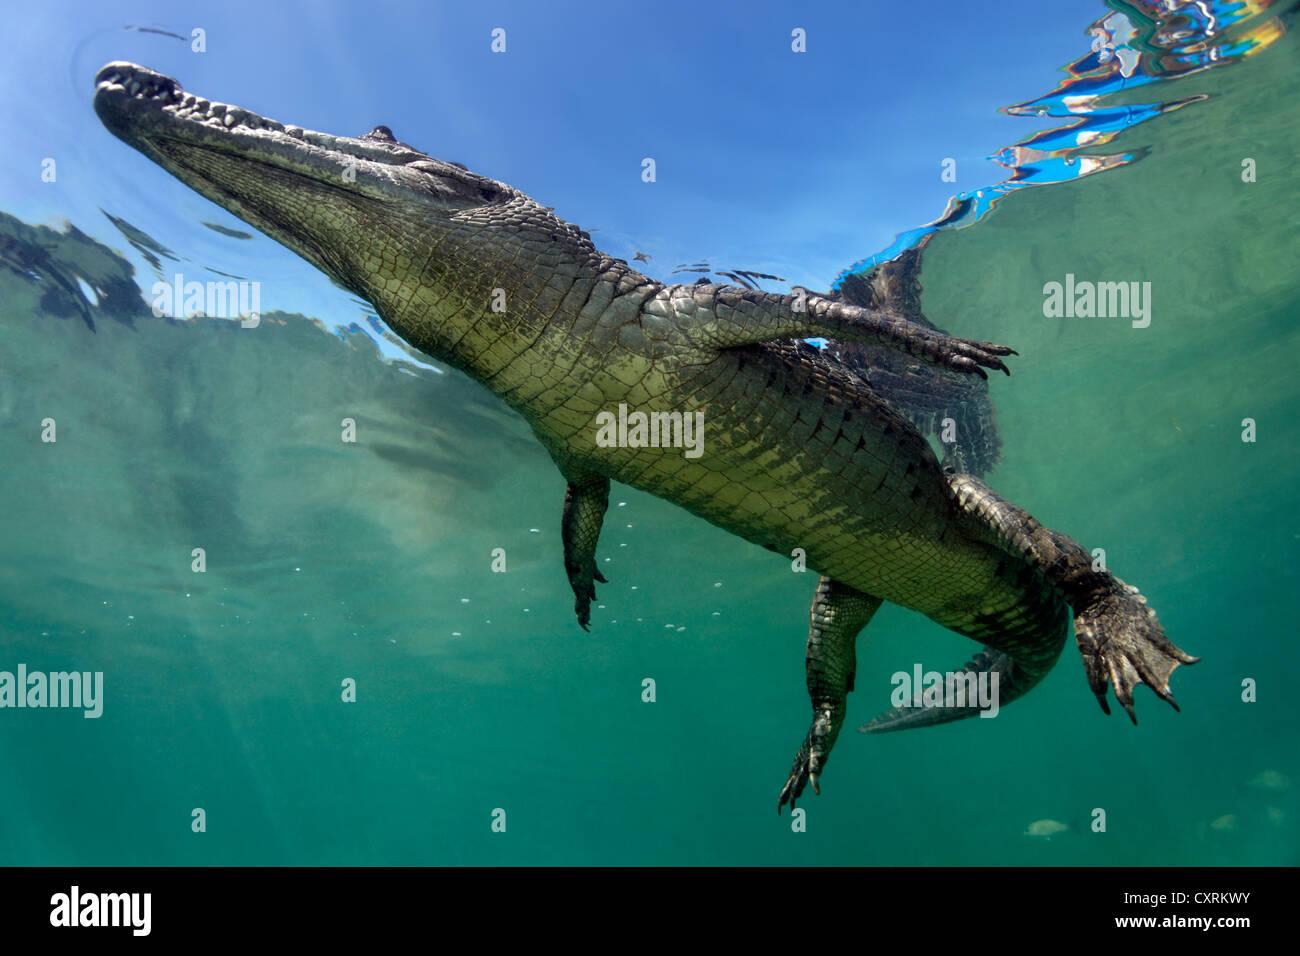 Saltwater Crocodile or Estuarine Crocodile or Indo-Pacific Crocodile (Crocodylus porosus), underwater, swimming Stock Photo